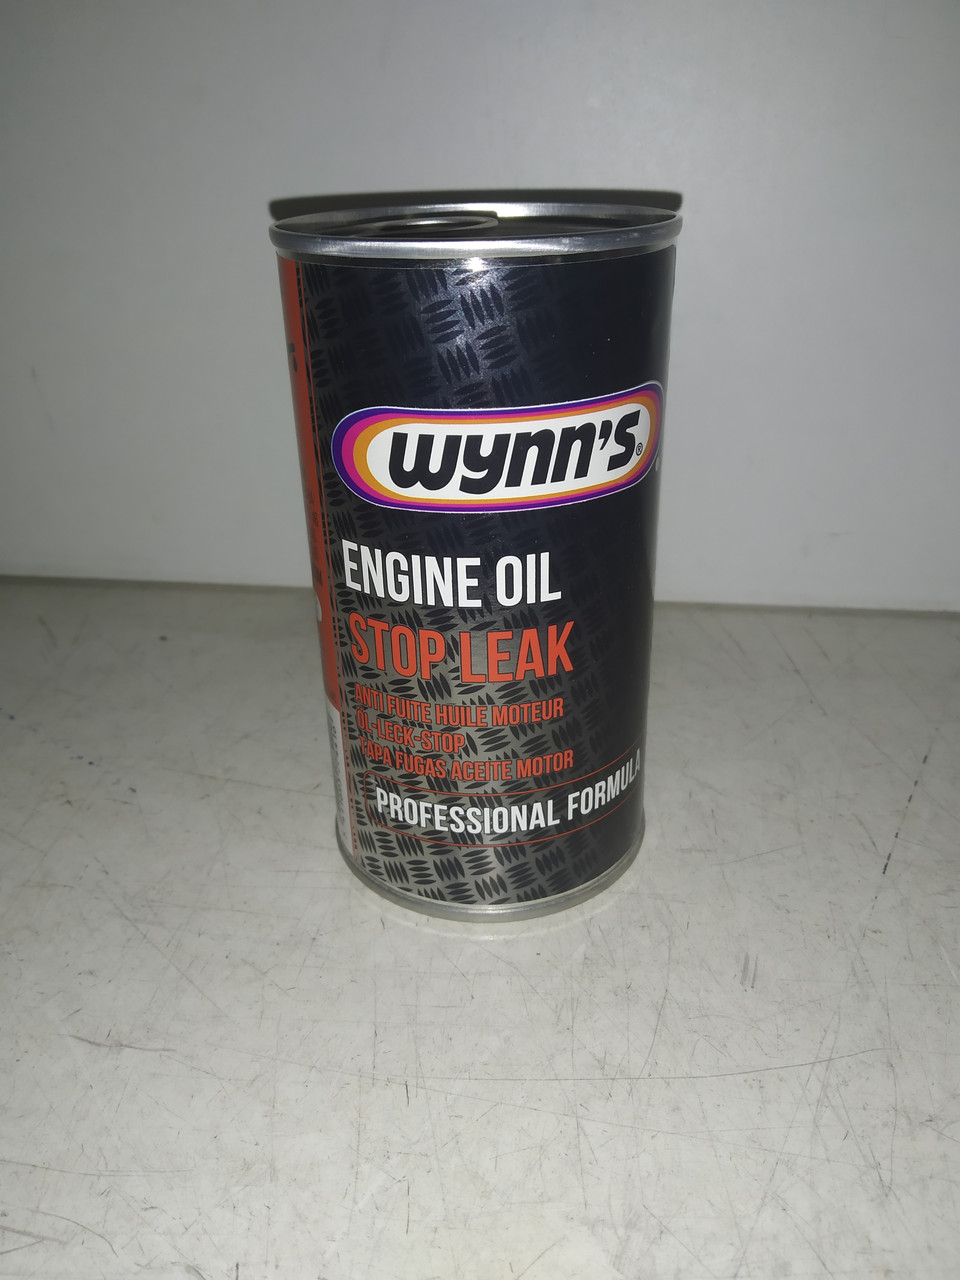 Герметик смазочной системы Wynn's Engine Oil Stop Leak 325 мл